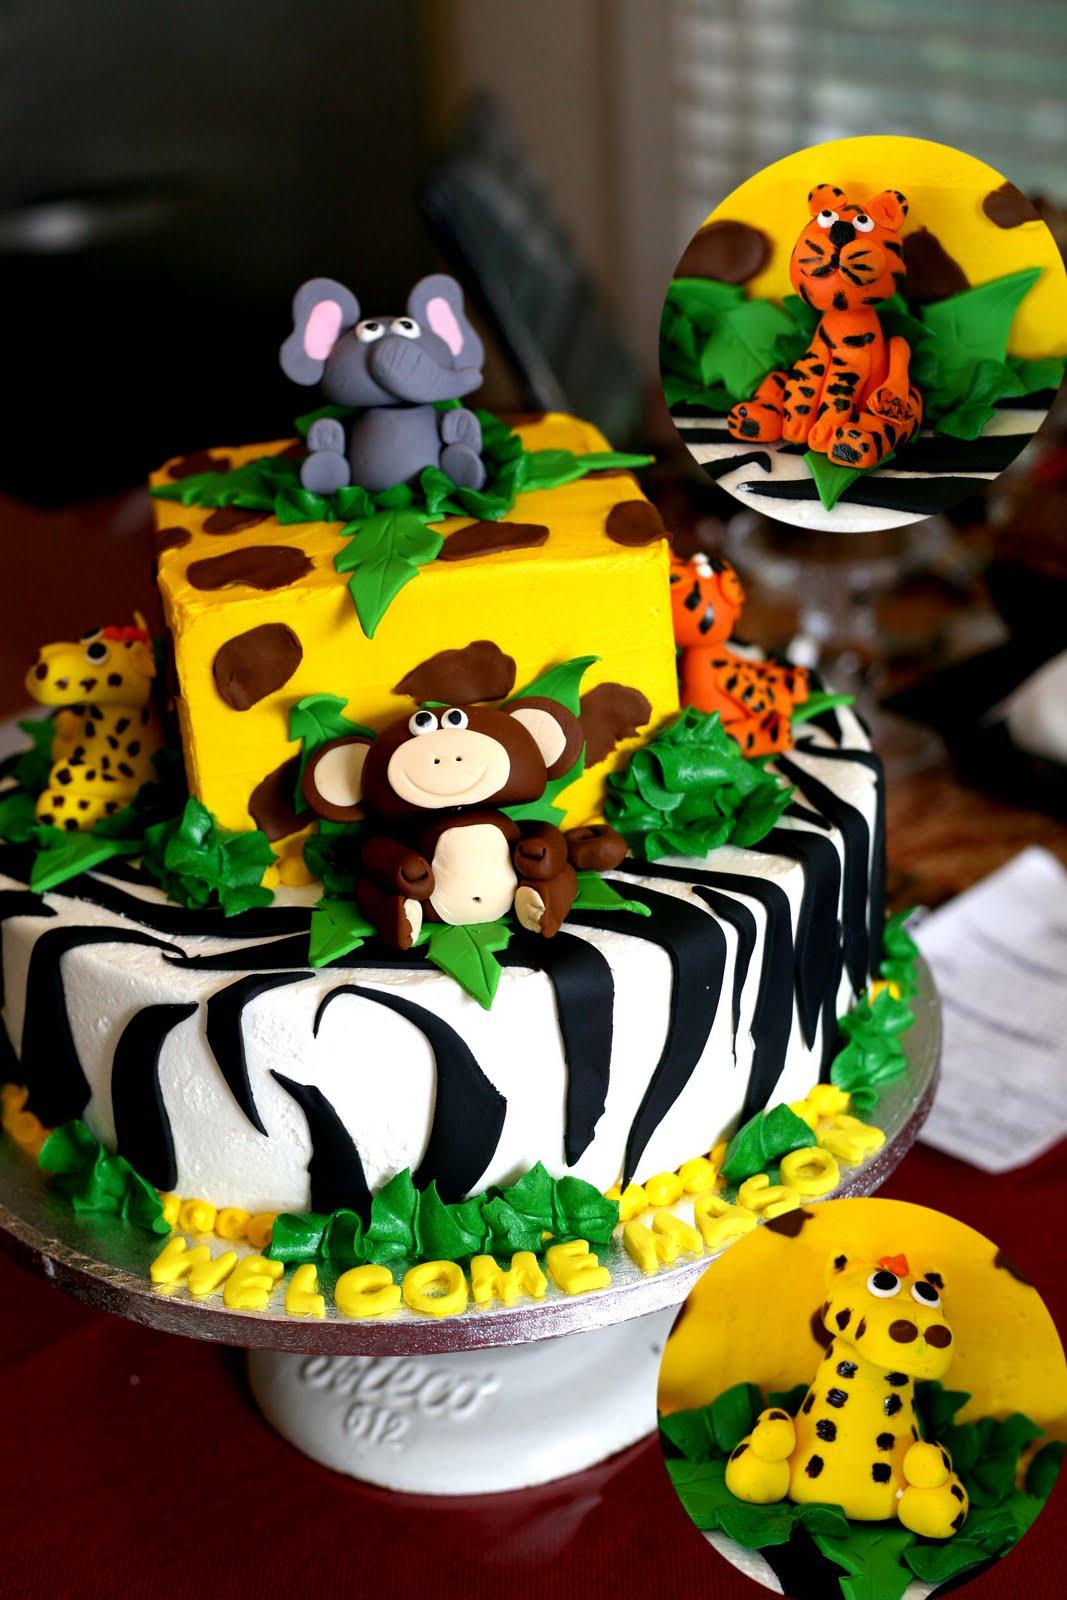 Hector's Custom Cakes: February 2011